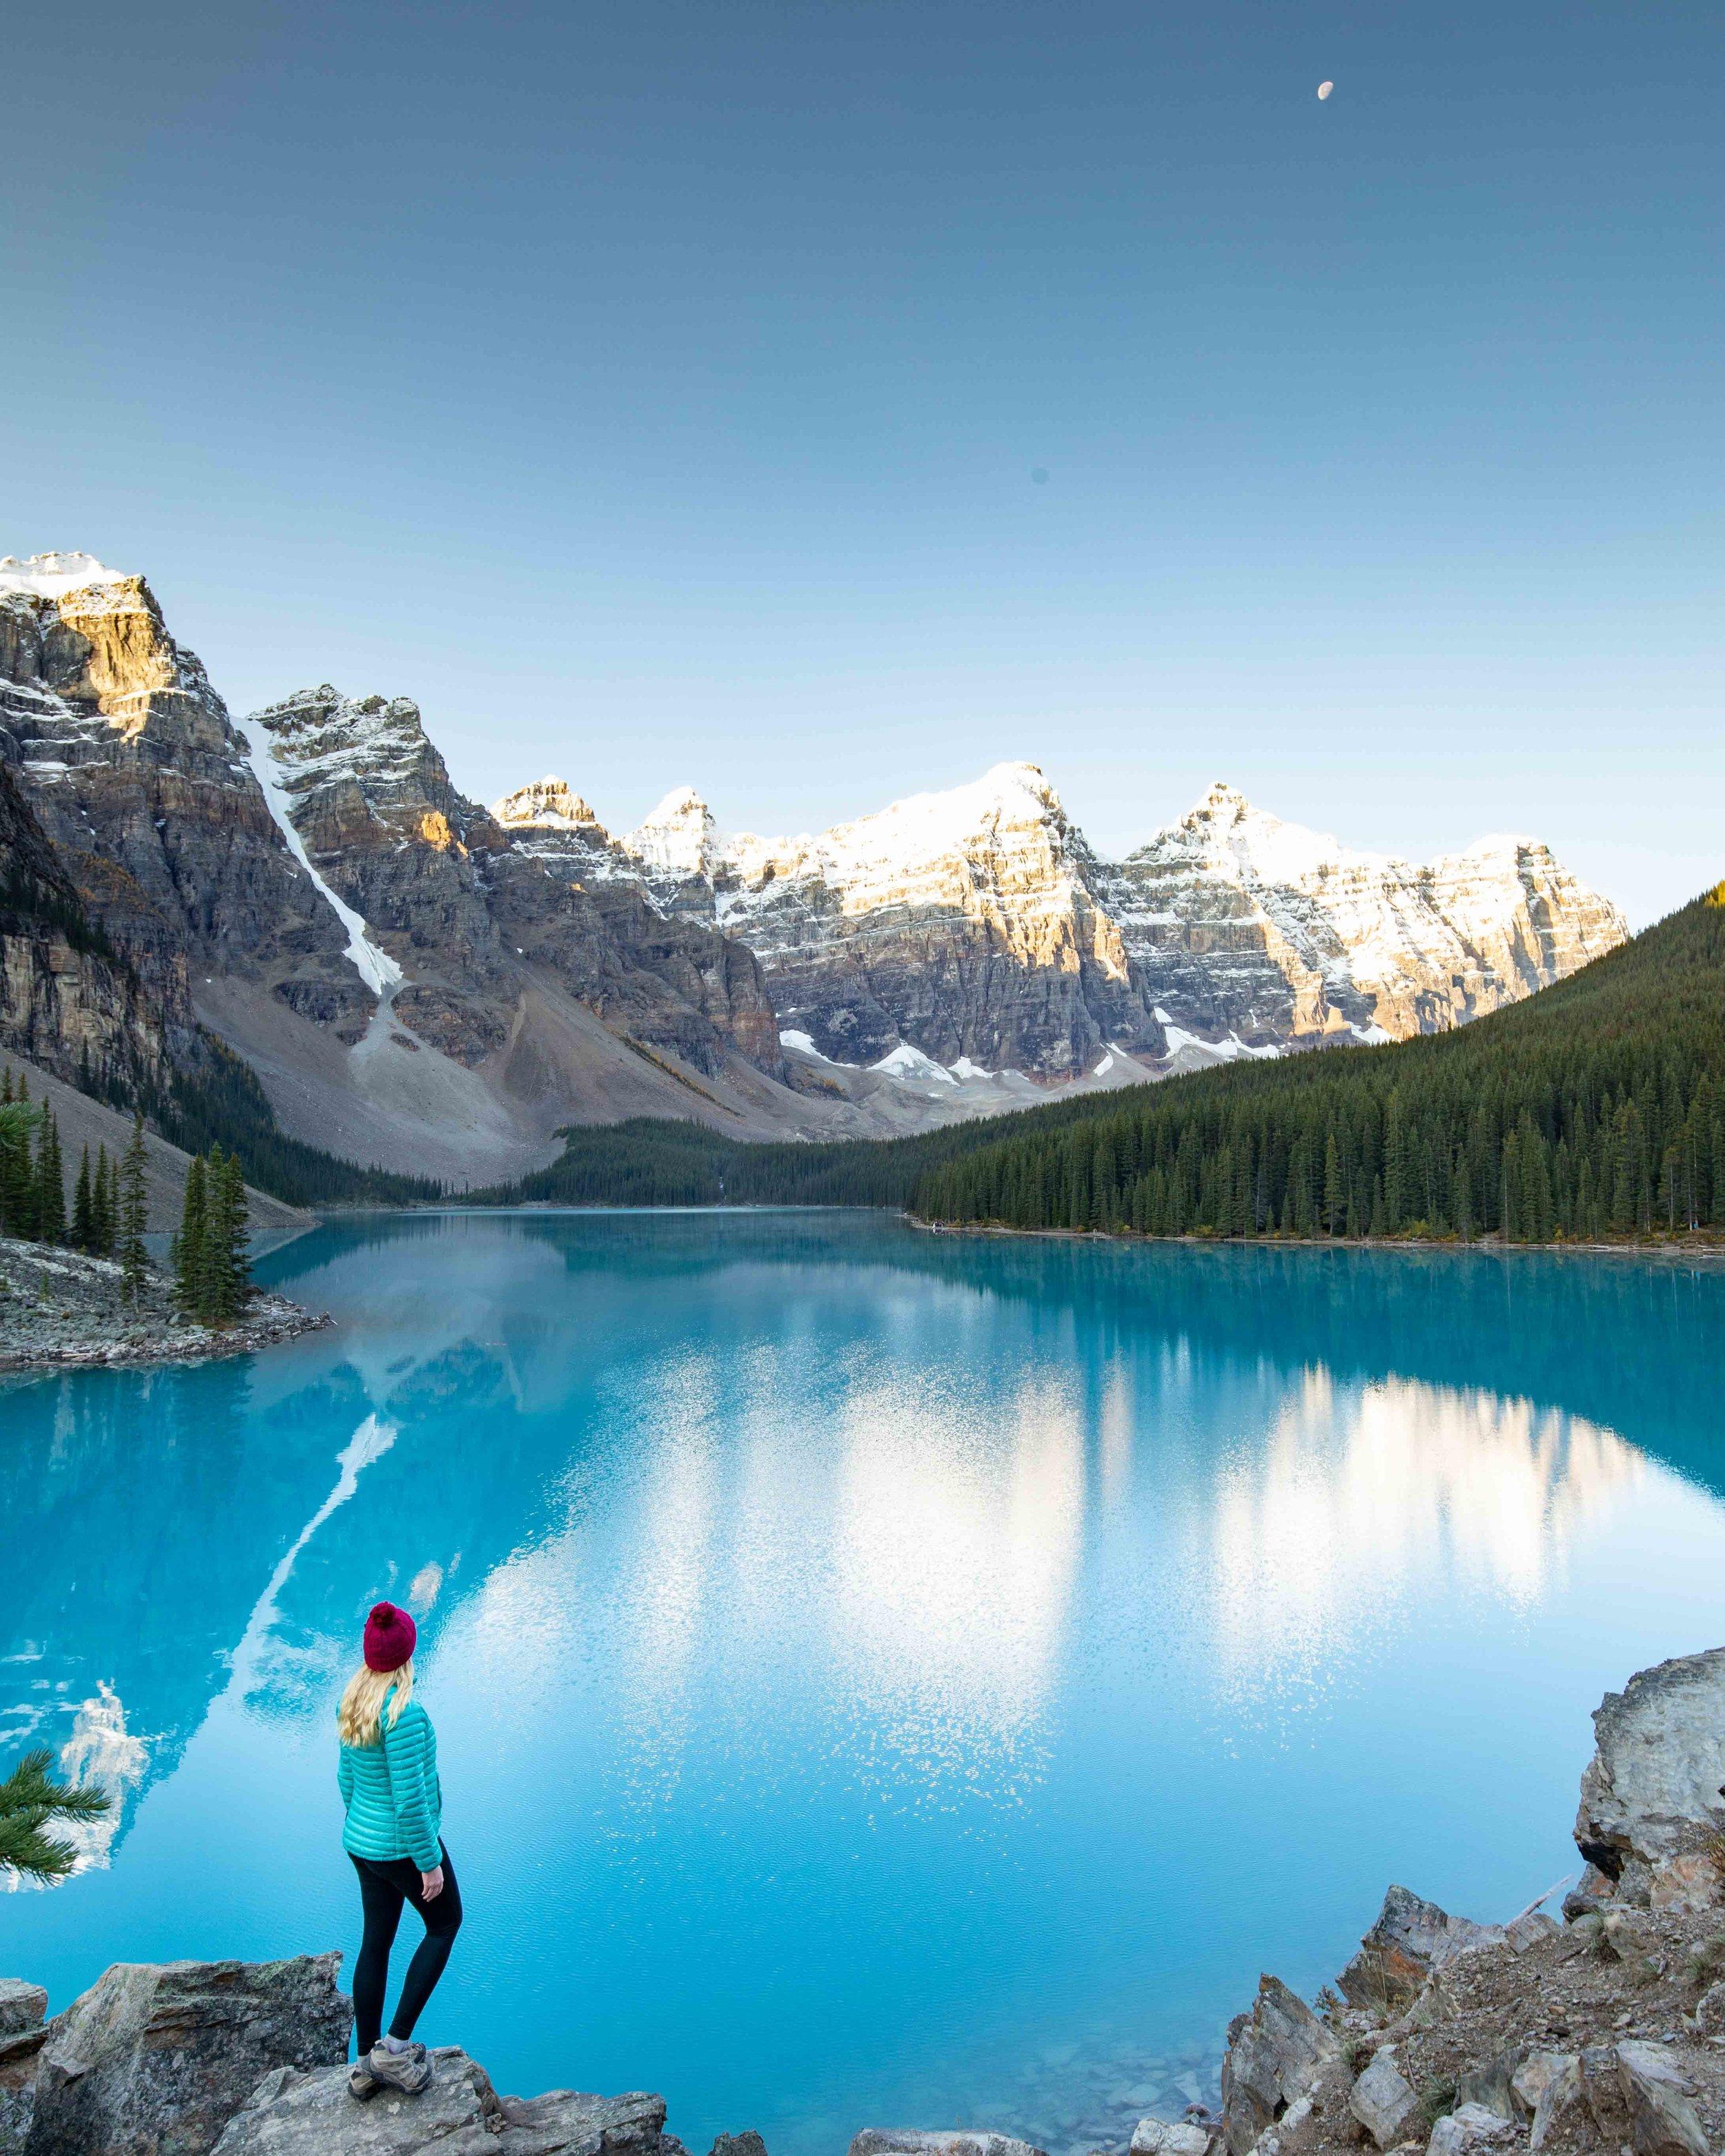 Morraine Lake Sunrise - things to do in Lake Louise